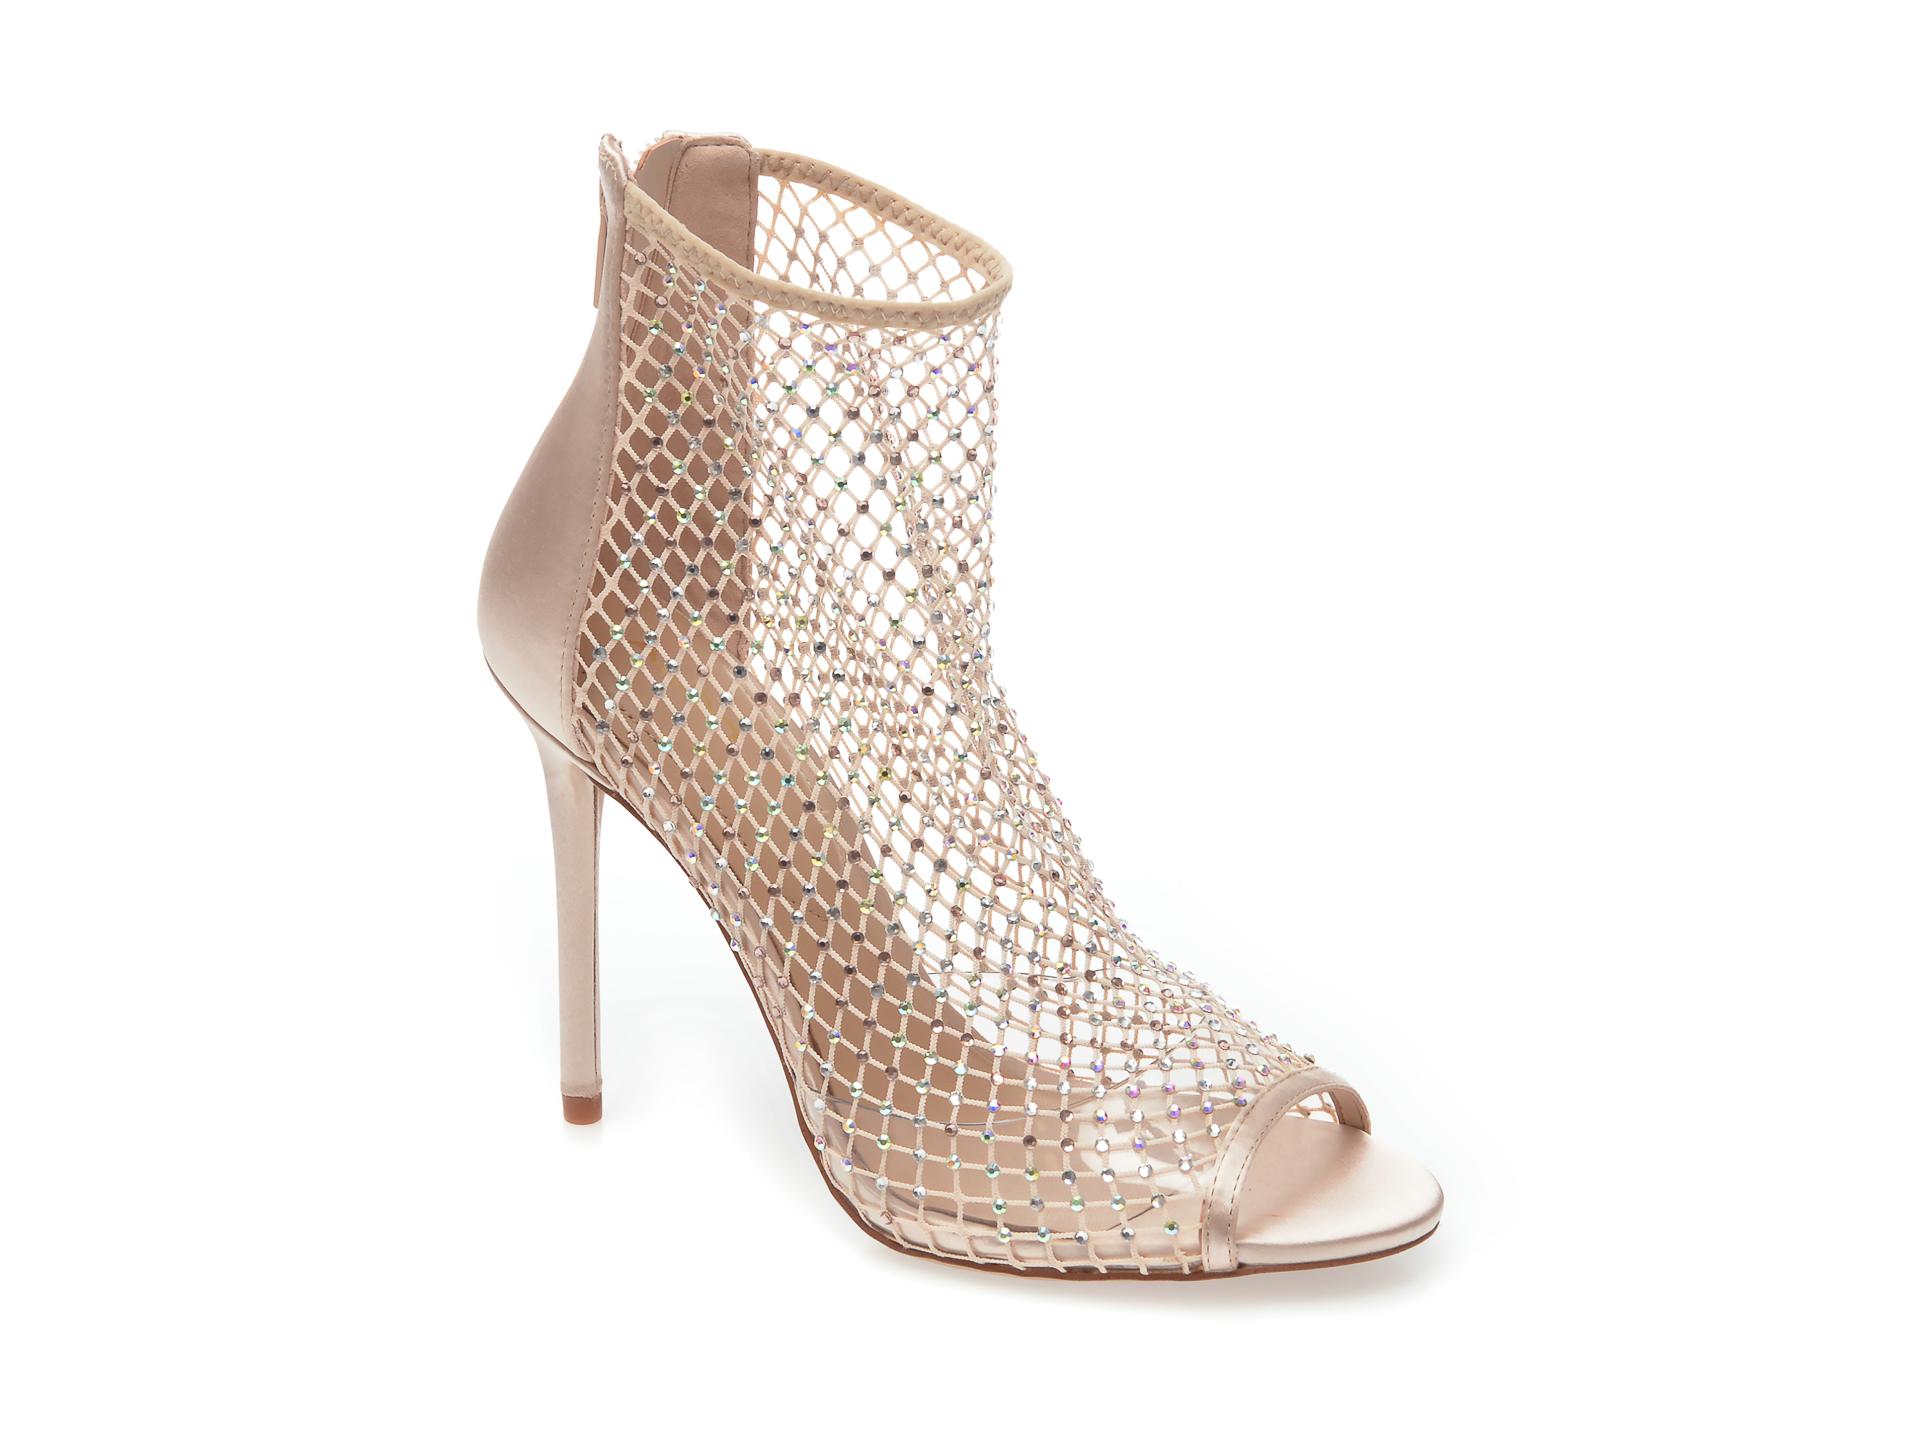 Sandale ALDO nude, Adhalia680, din material textil New